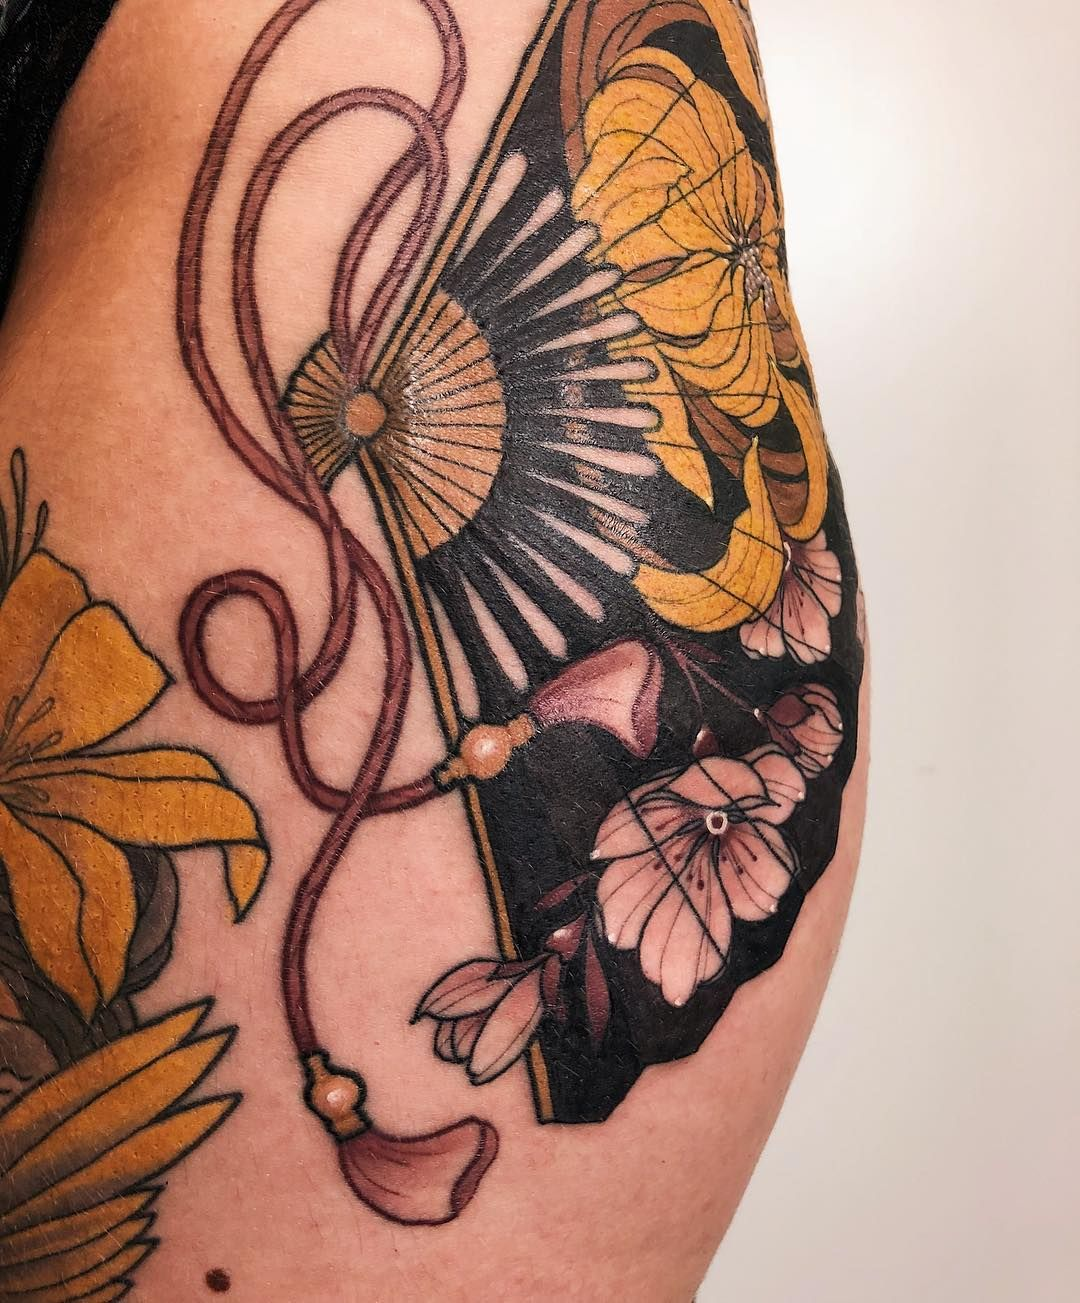 Catalogo Tatuaje Japones Significado (197)